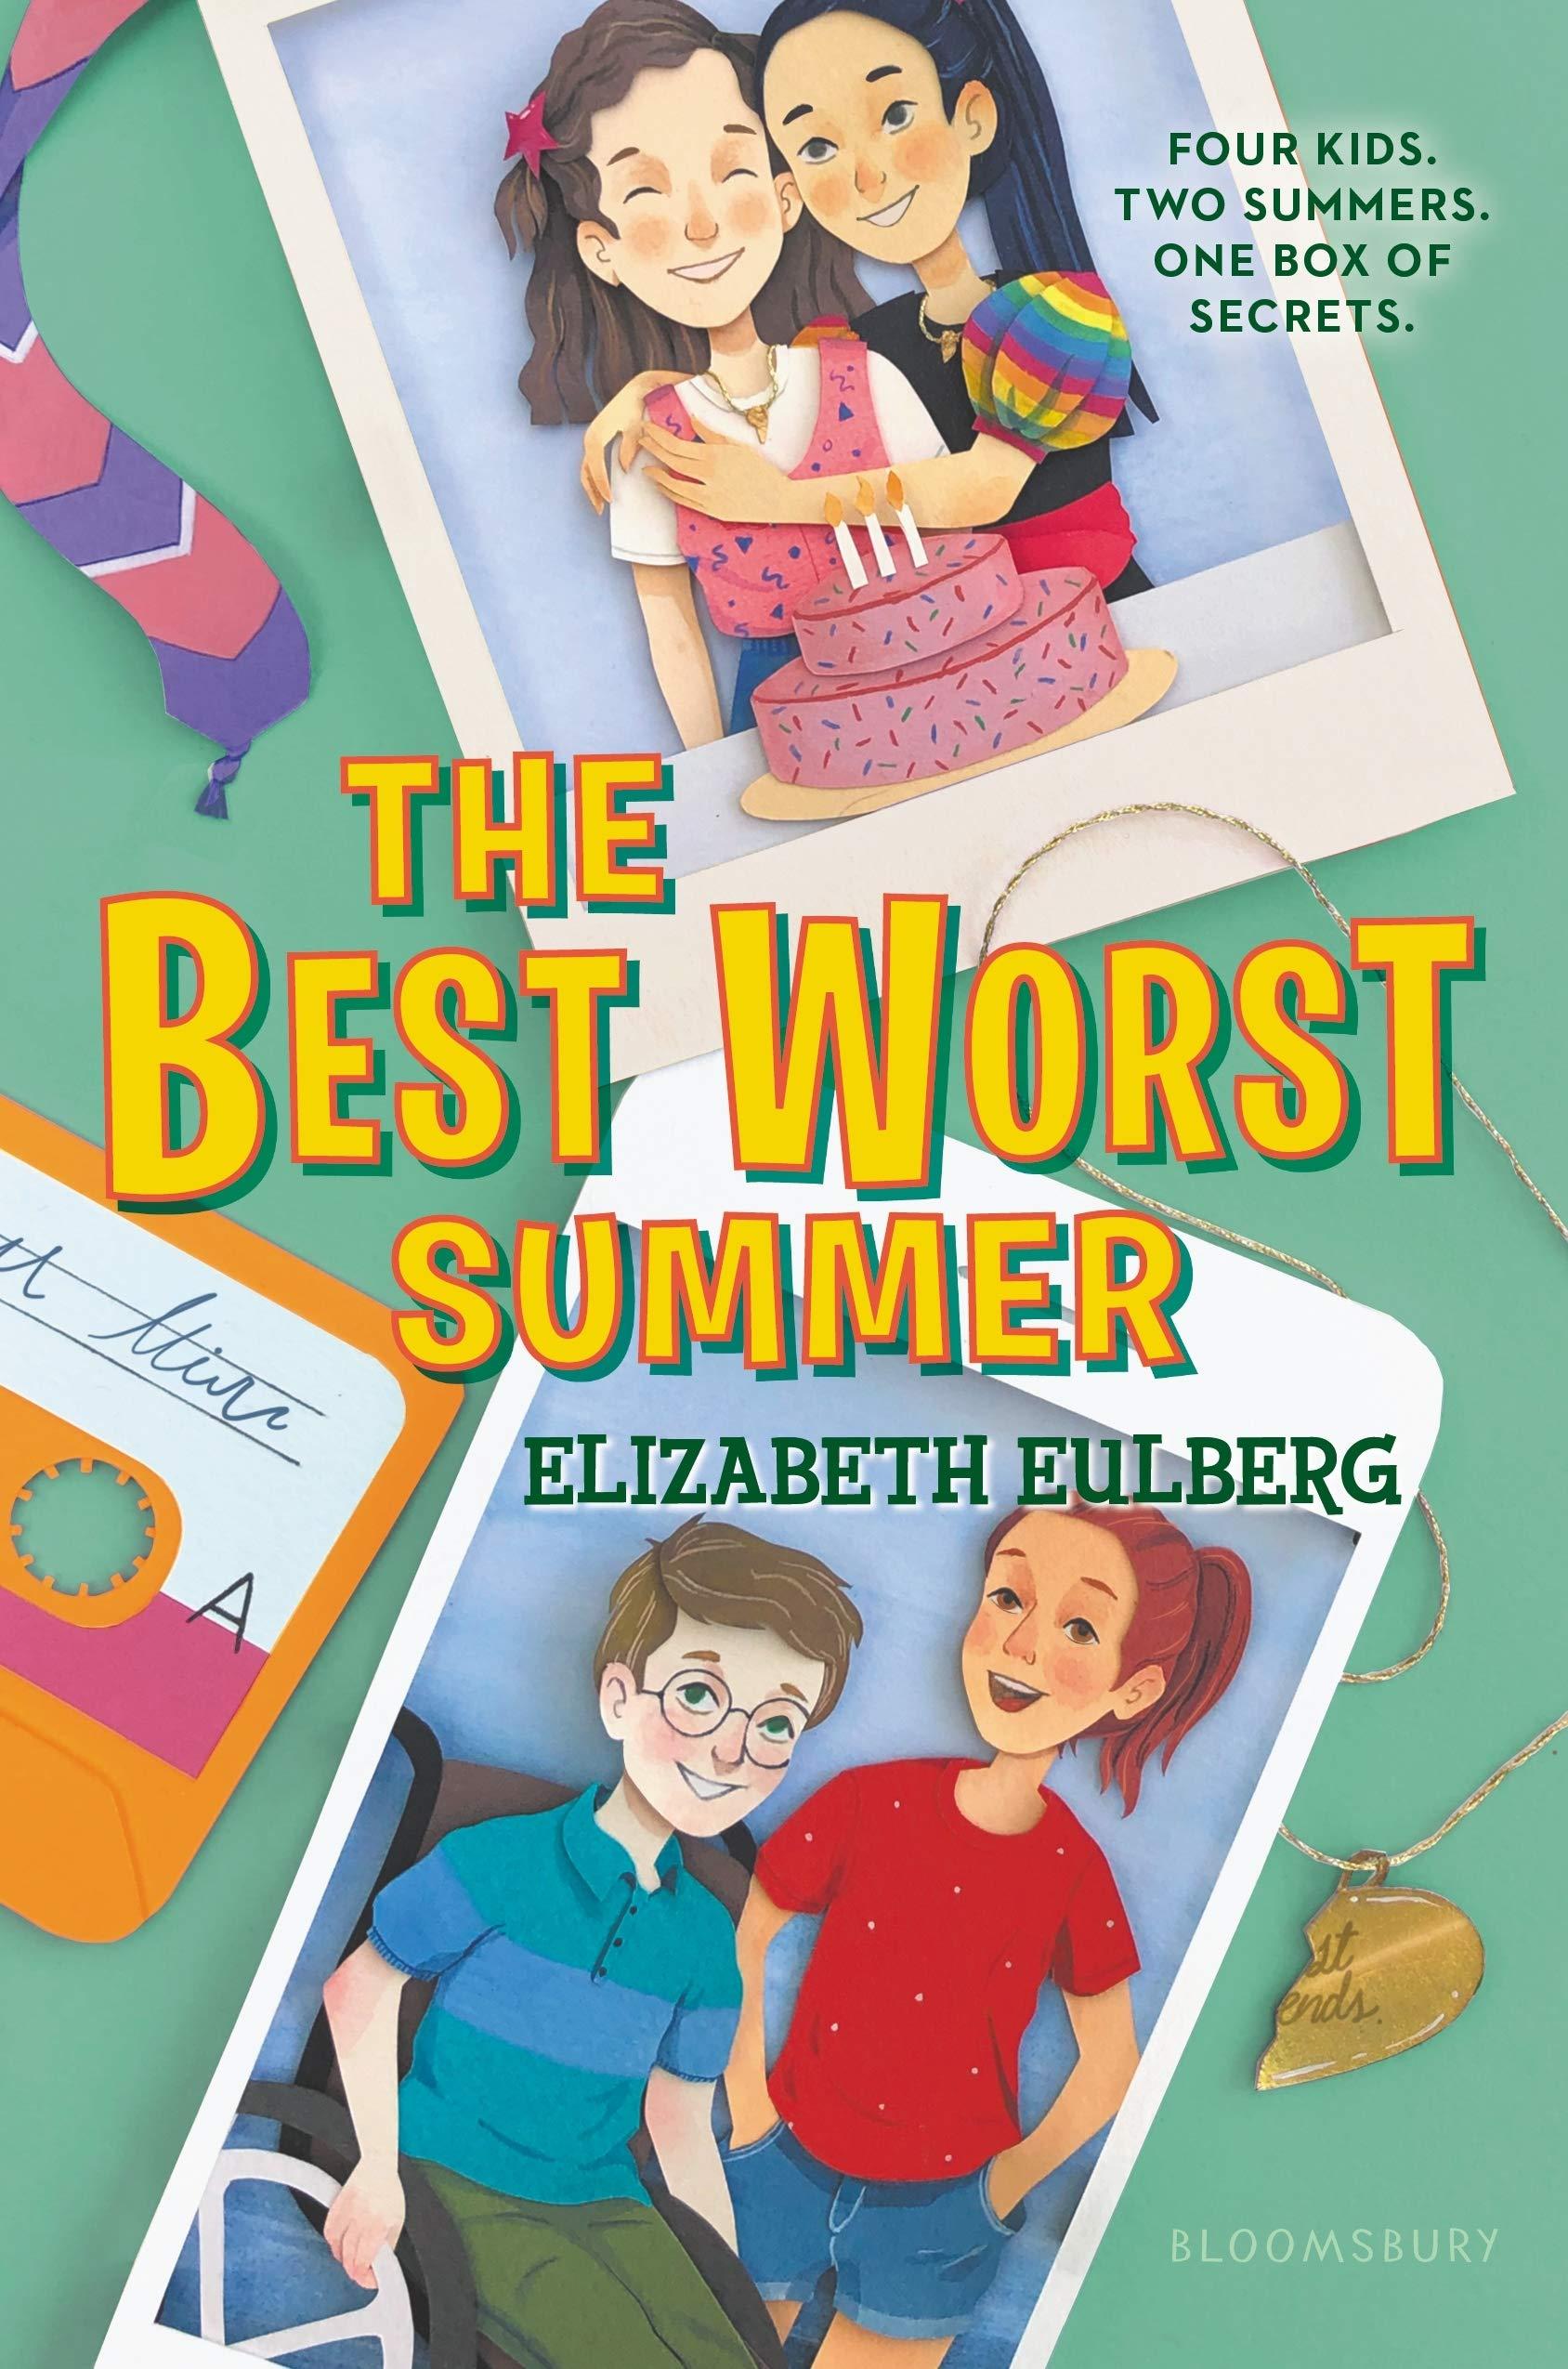 Best Worst Summer Eulberg